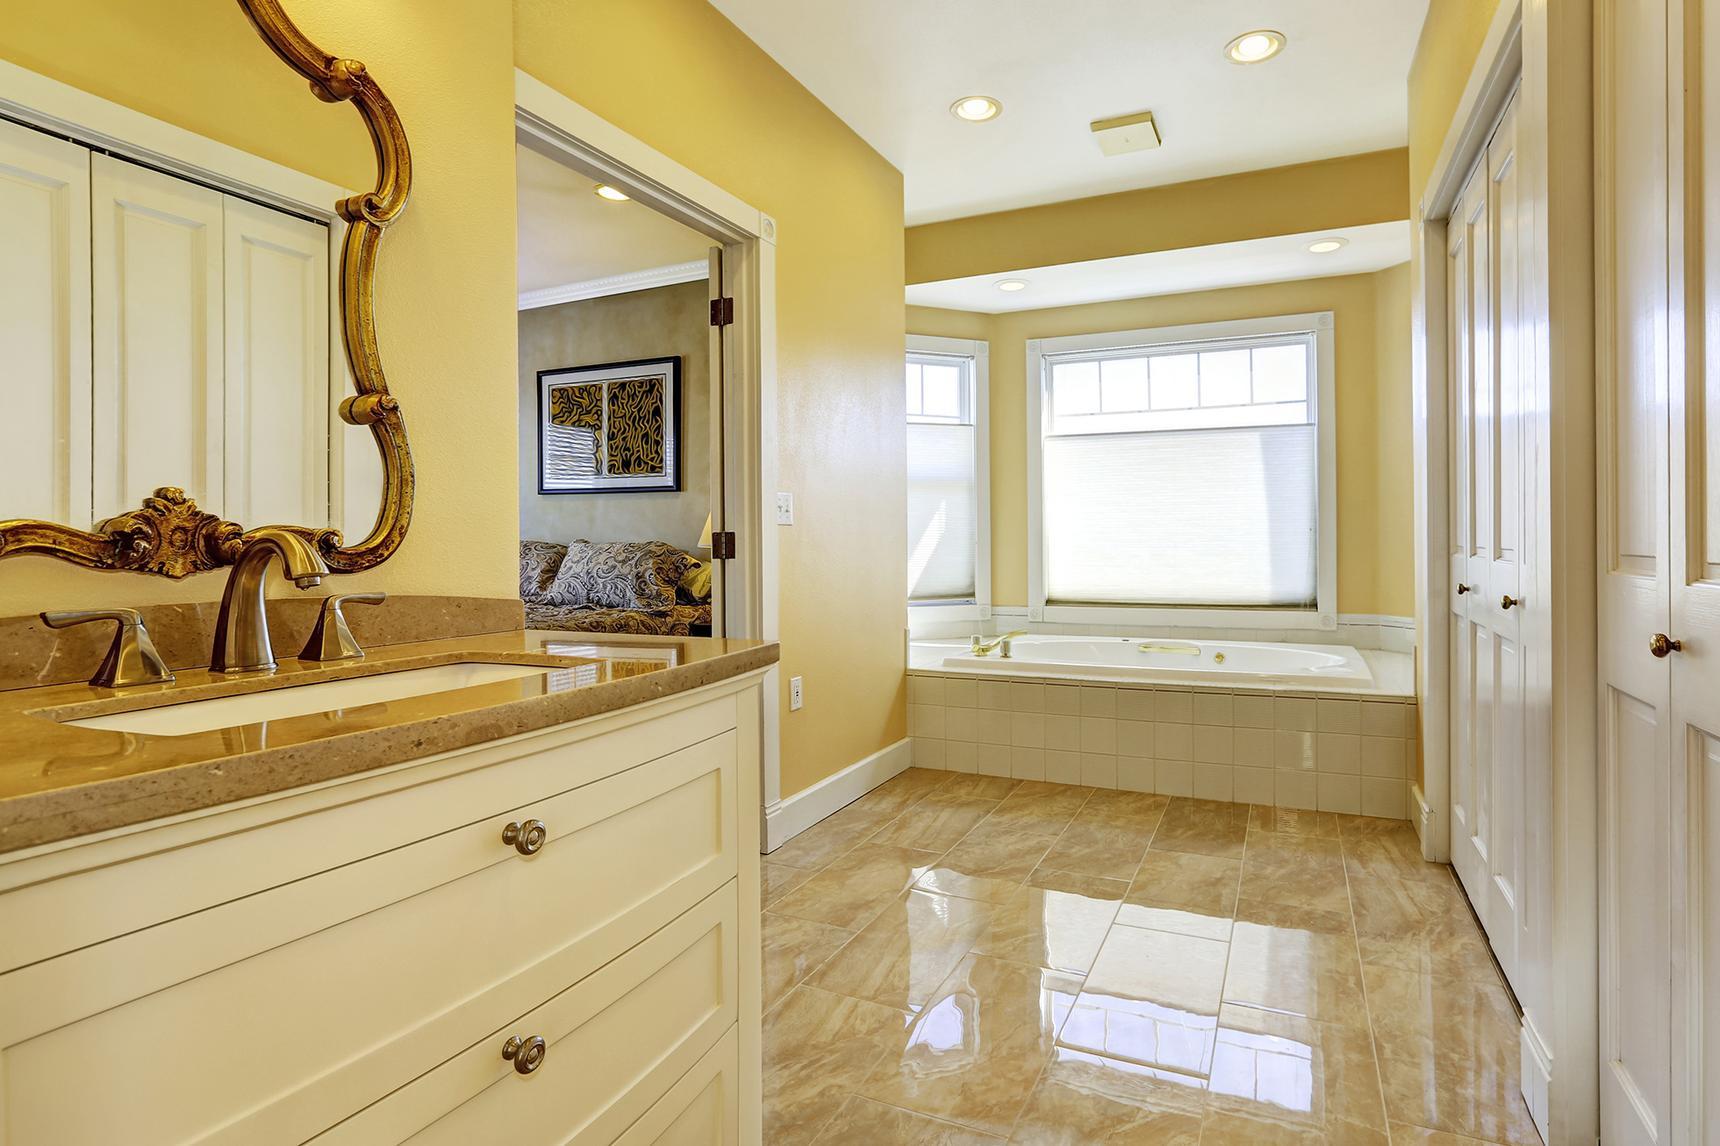 Bathroom flooring materials